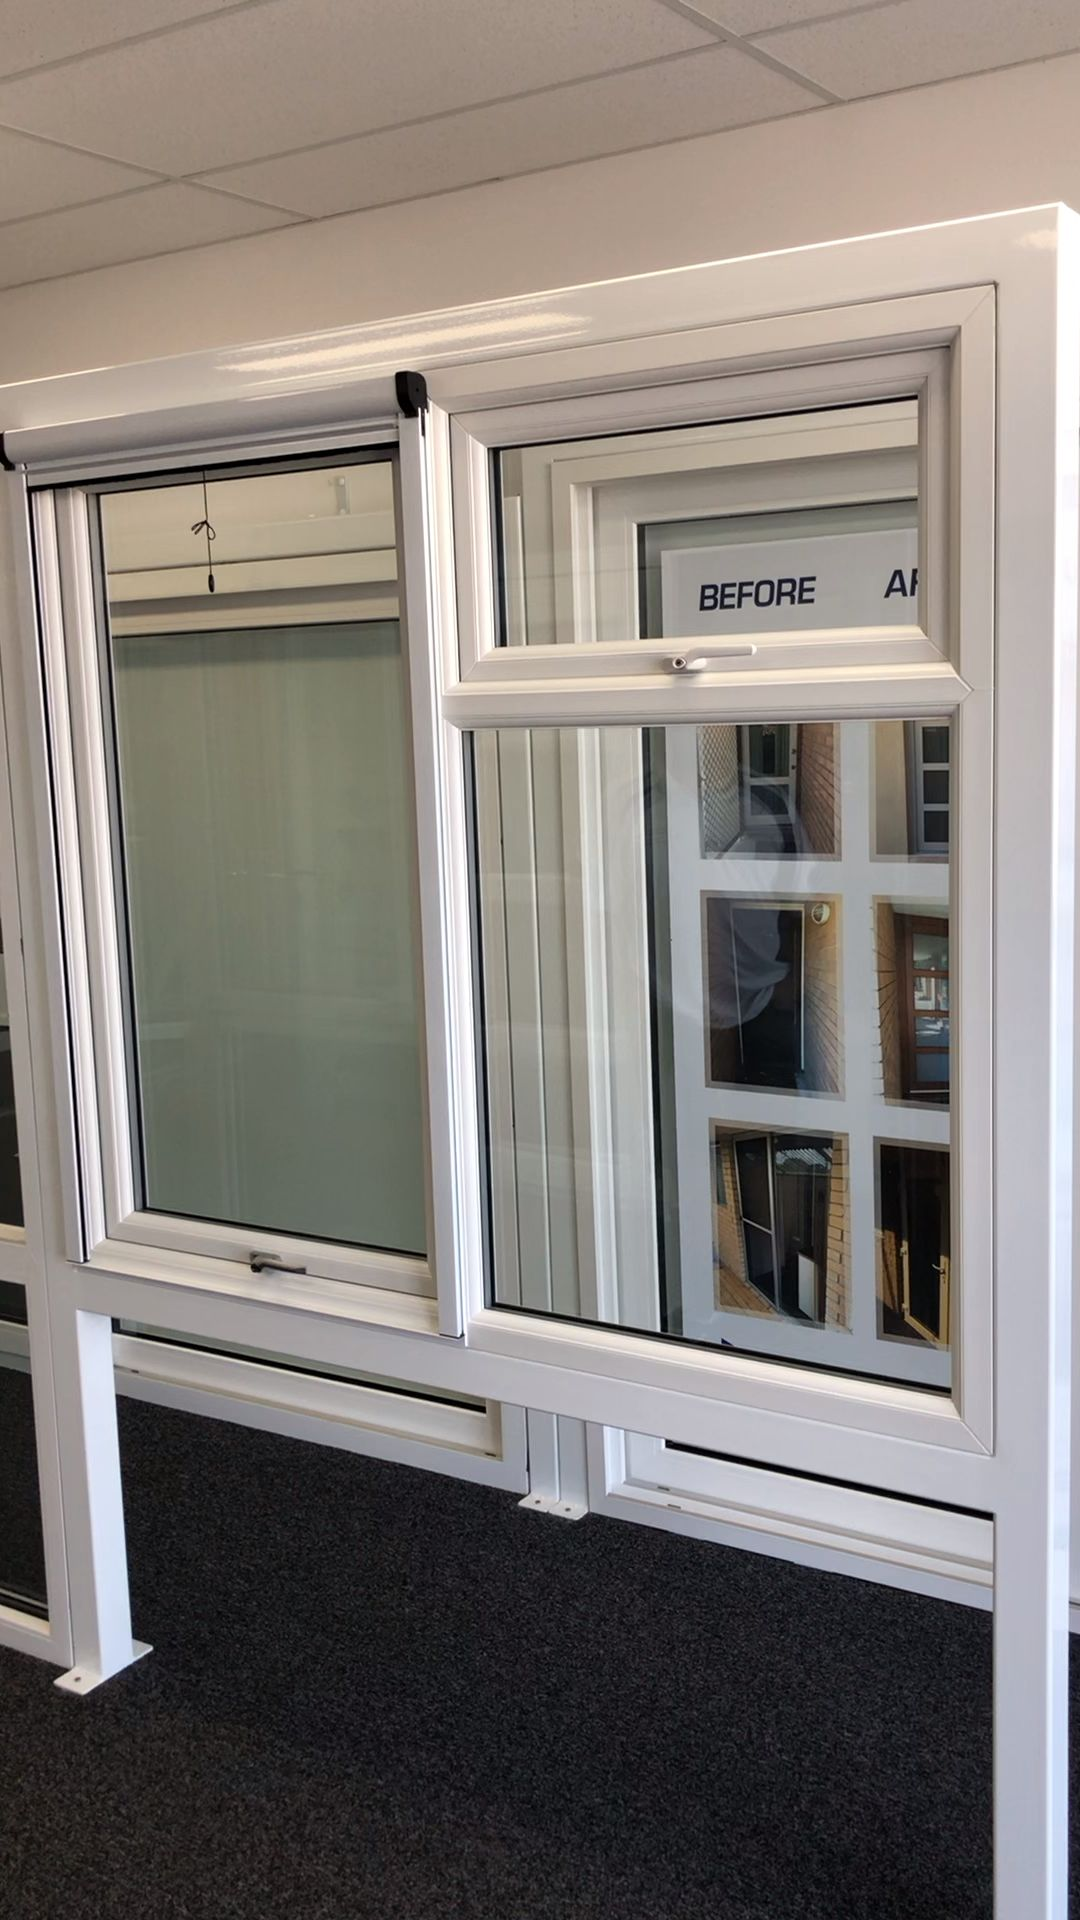 Upvc Double Glazed Awning Windows By Affordable Double Glazing Video Ventanas De Aluminio Modernas Diseno Ventanas Ventanas Para Bano